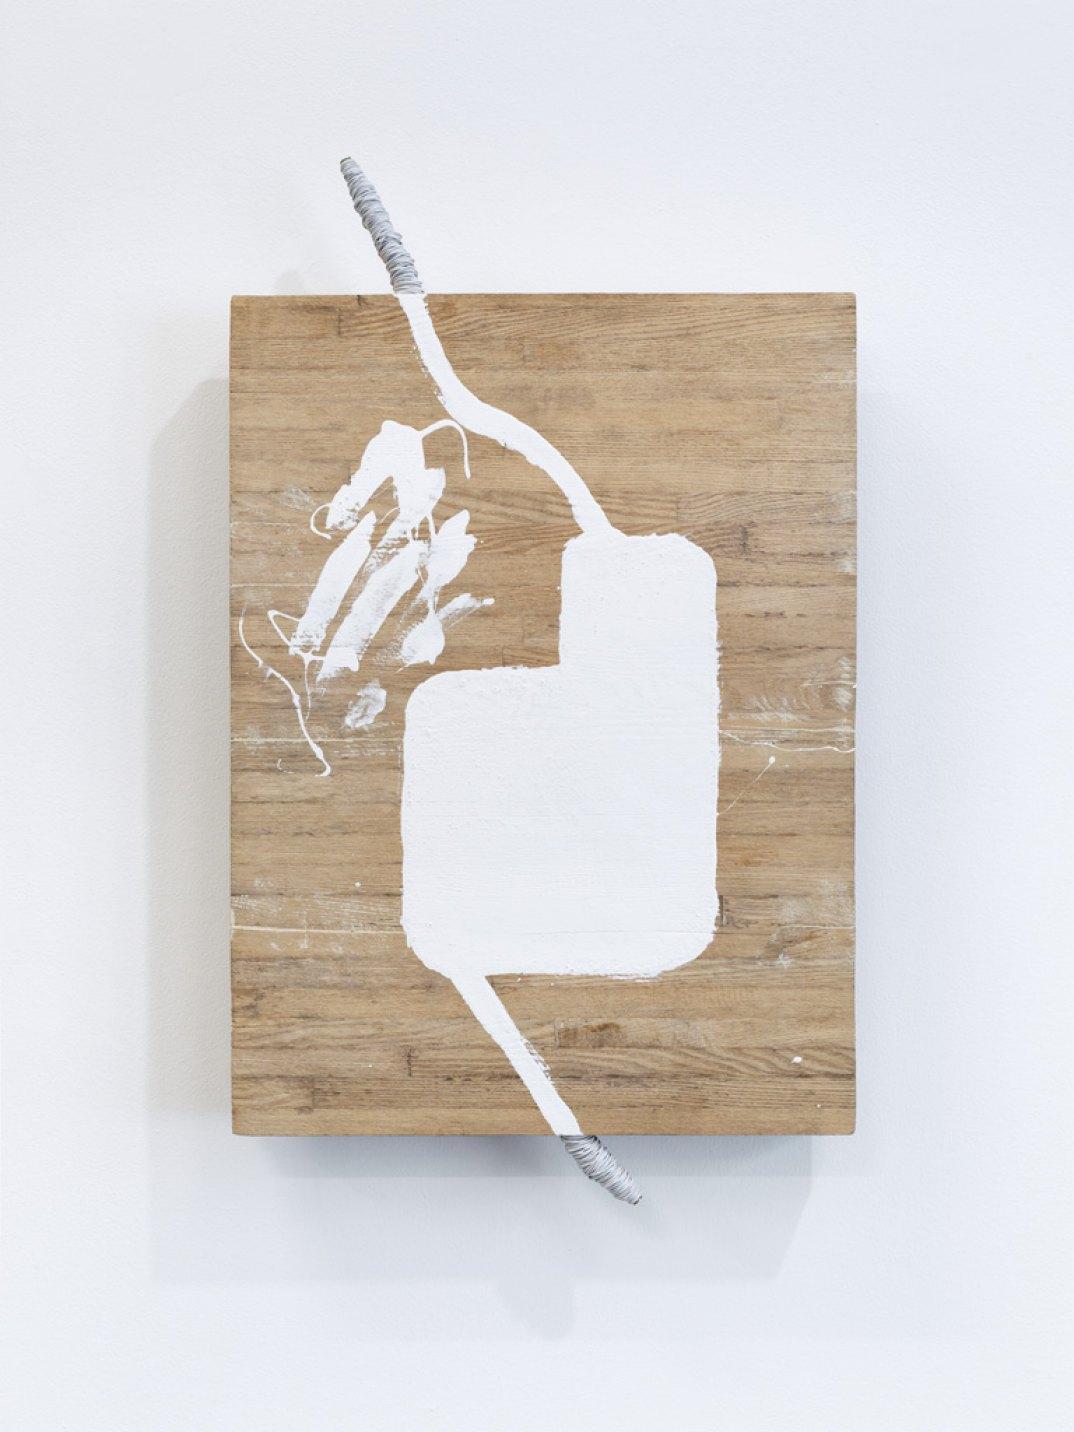 Kishio Suga,<em>Separation of Bound Spaces</em>, 1993, wood, wire, white paint, 74 × 43,5 × 7 cm - Mendes Wood DM